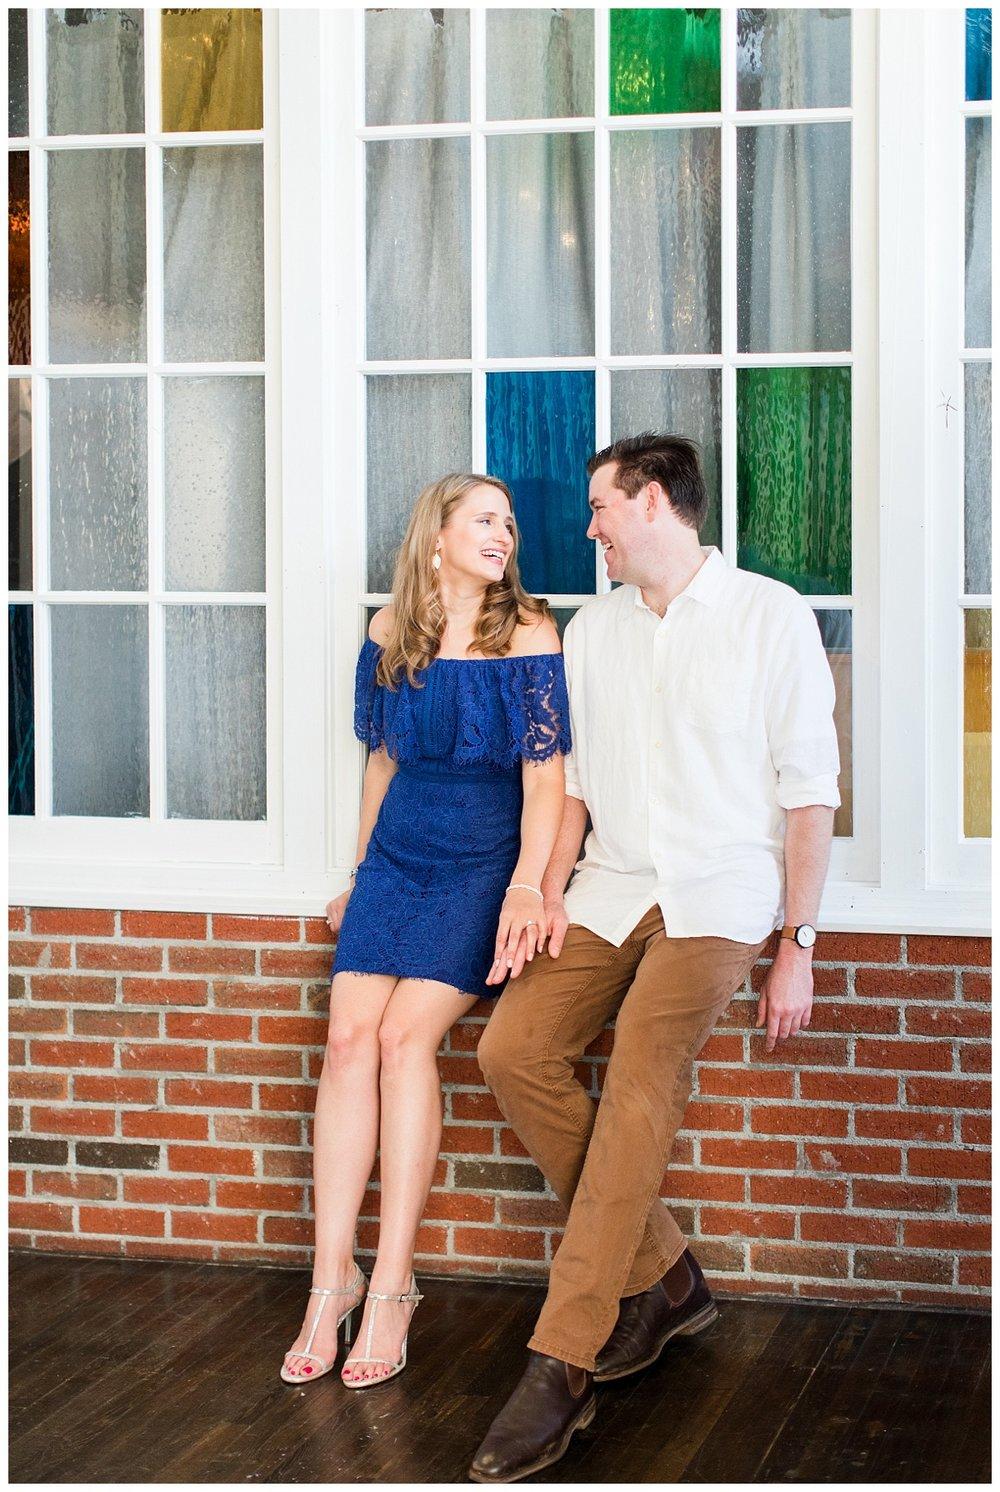 Engagement Pictures_KIm and Hamish_Abby Breaux Photography_Atlanta_Ponce City Market_Jackson Street Bridge_0035.jpg